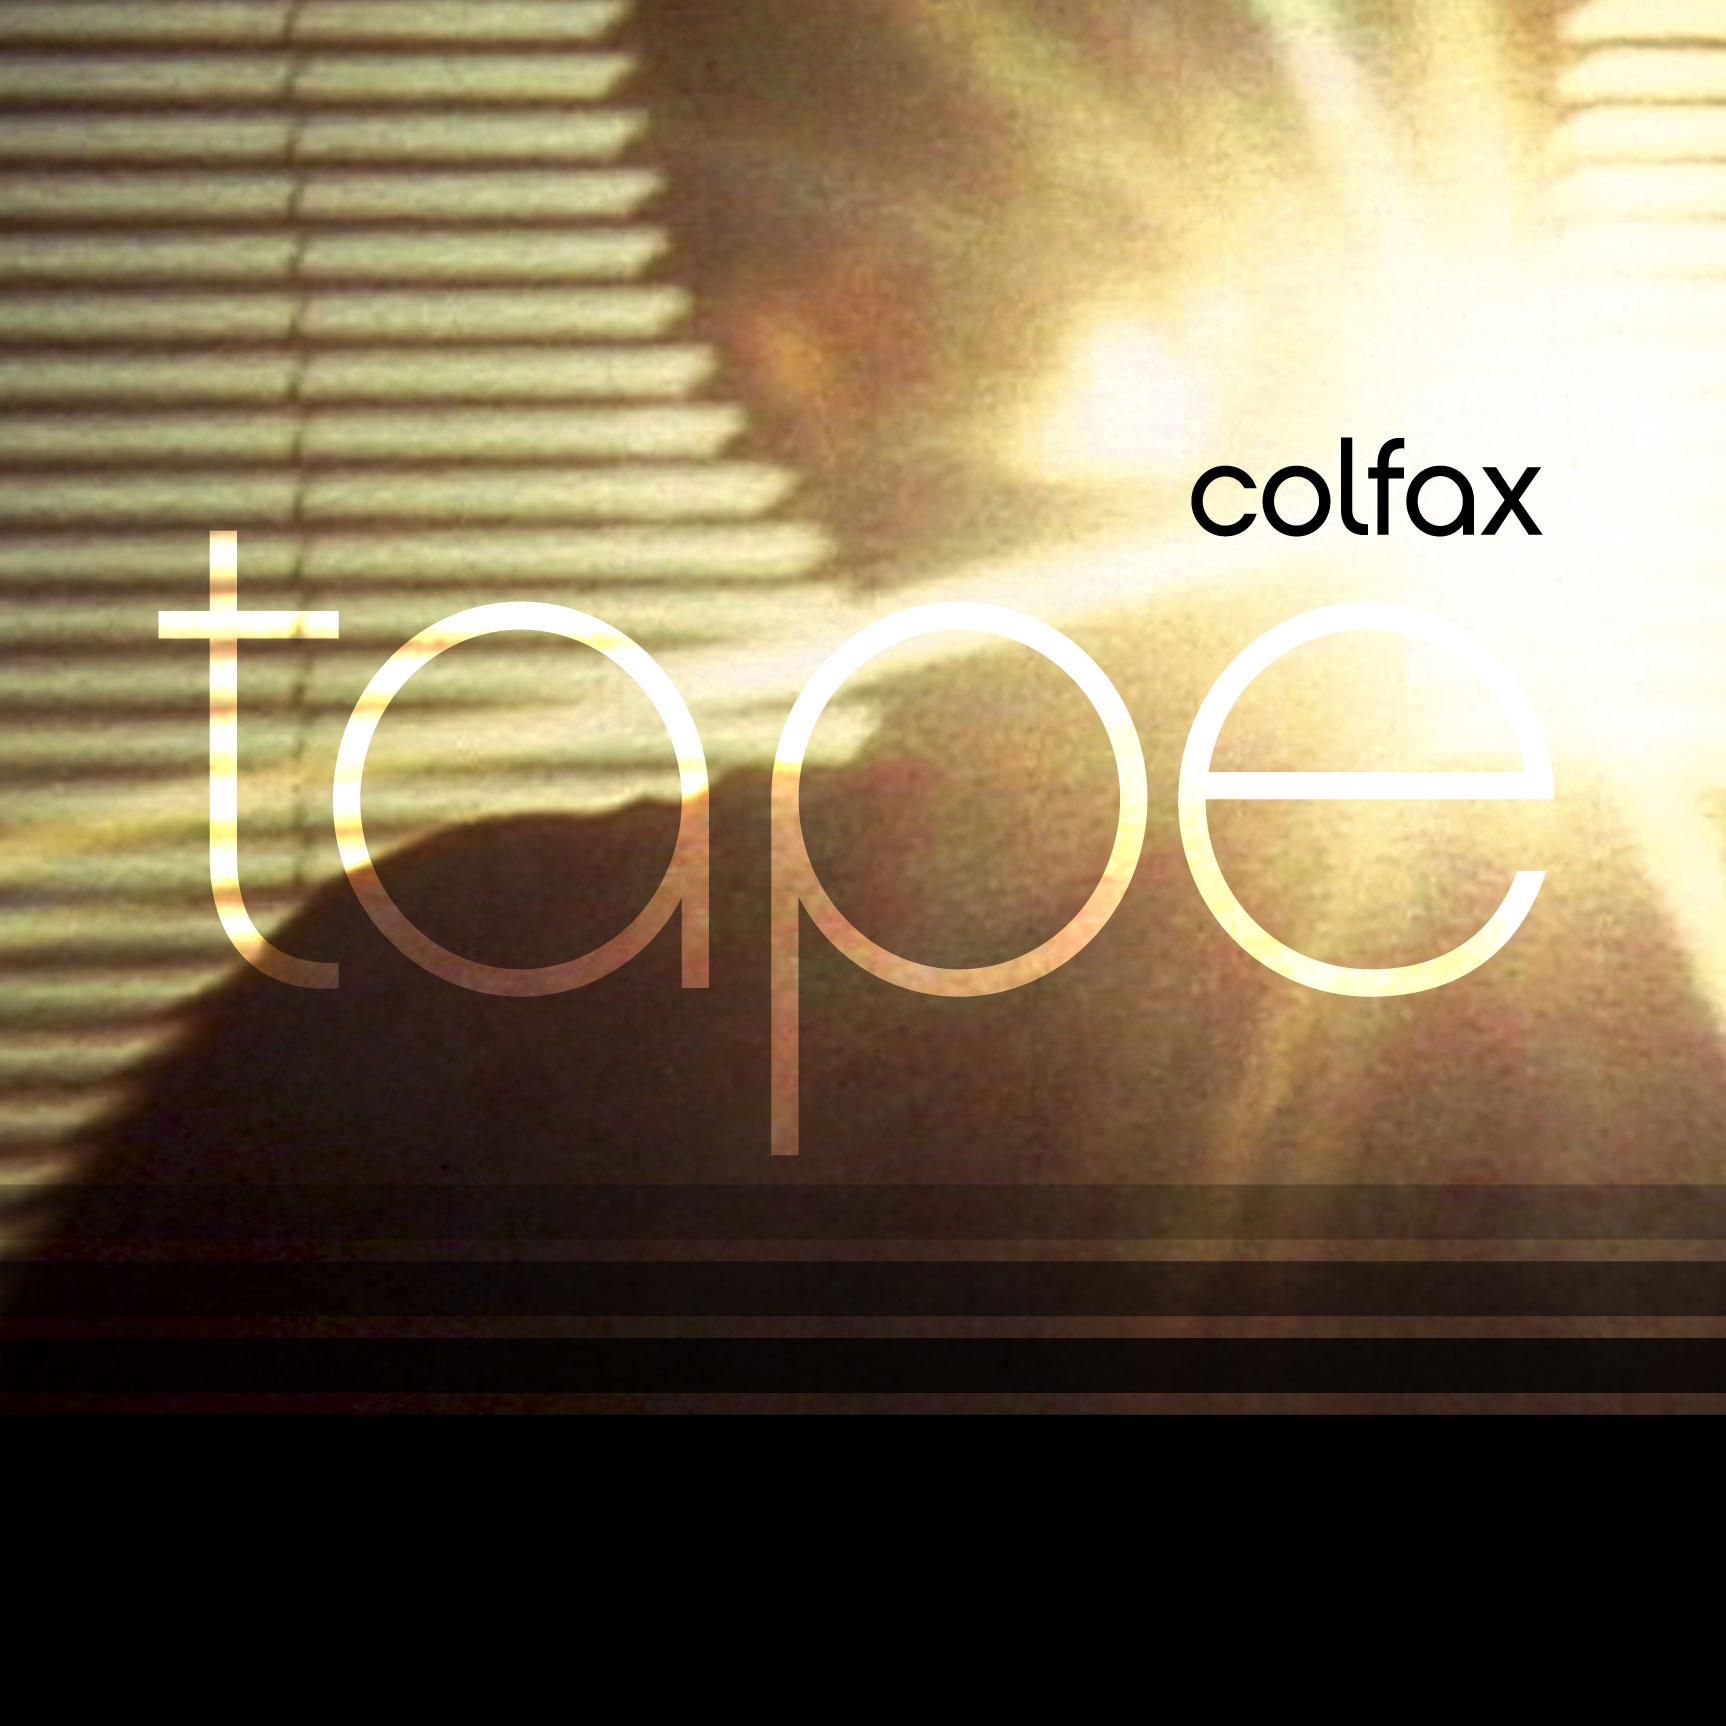 colfax-internet.jpg